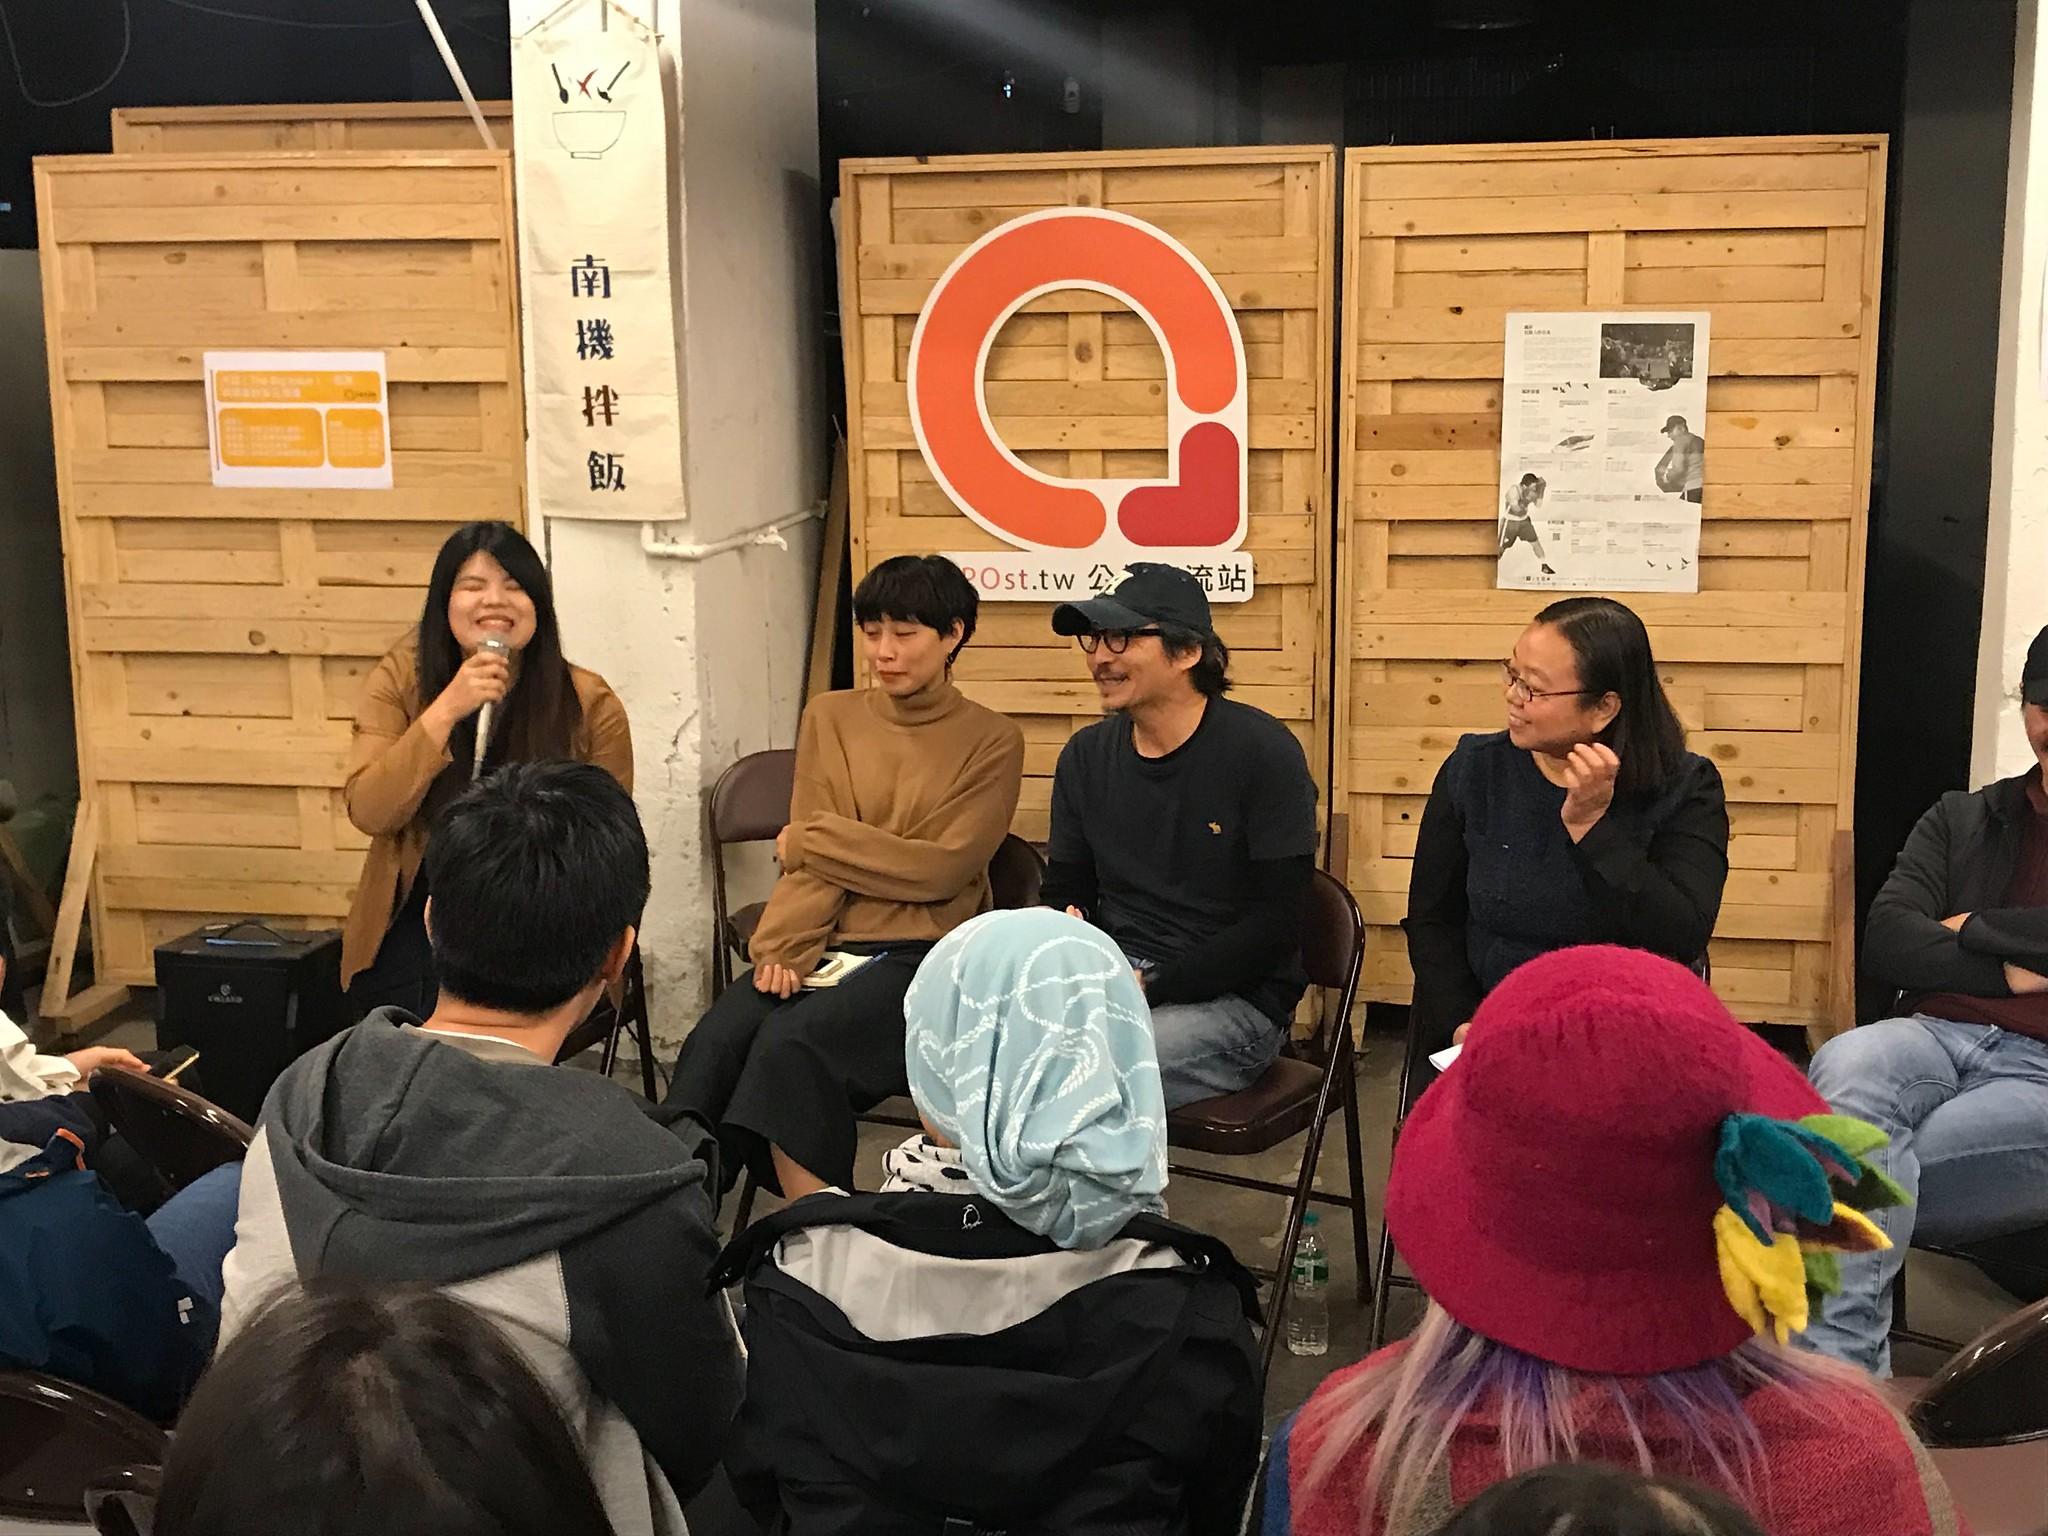 NPOst於昨日舉行「《大誌》、街友與勞雇的多元想像」論壇,針對社會企業的勞動問題進行討論。(攝影:張宗坤)